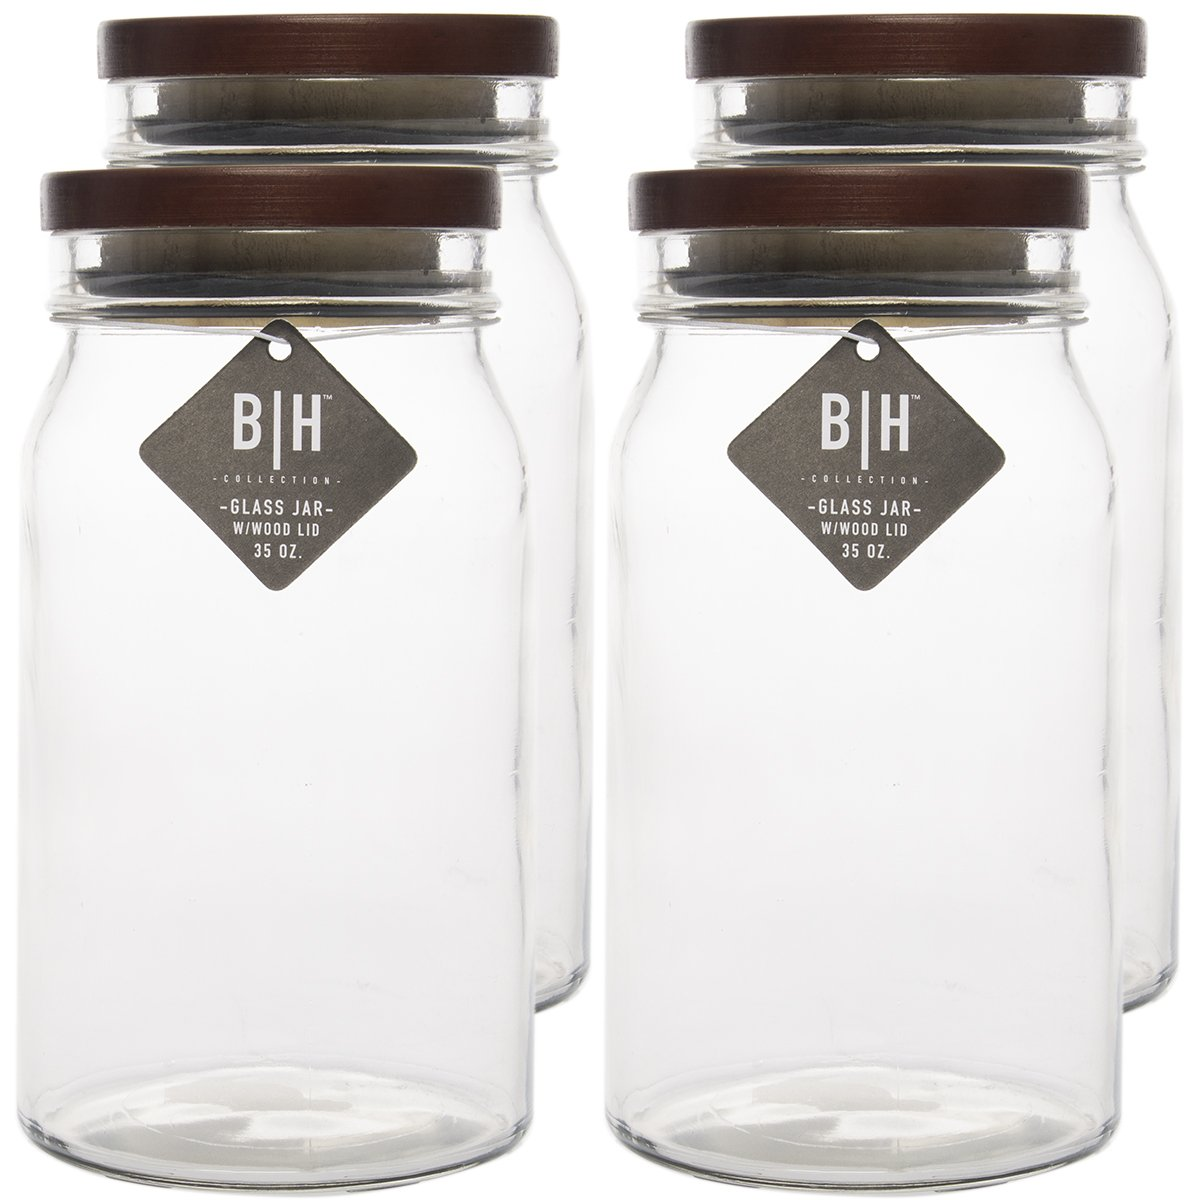 Blue Harbor (4 Pack) 35oz Clear Glass Storage Jars With Wood Lids Decorative Kitchen or Craft Jar Set